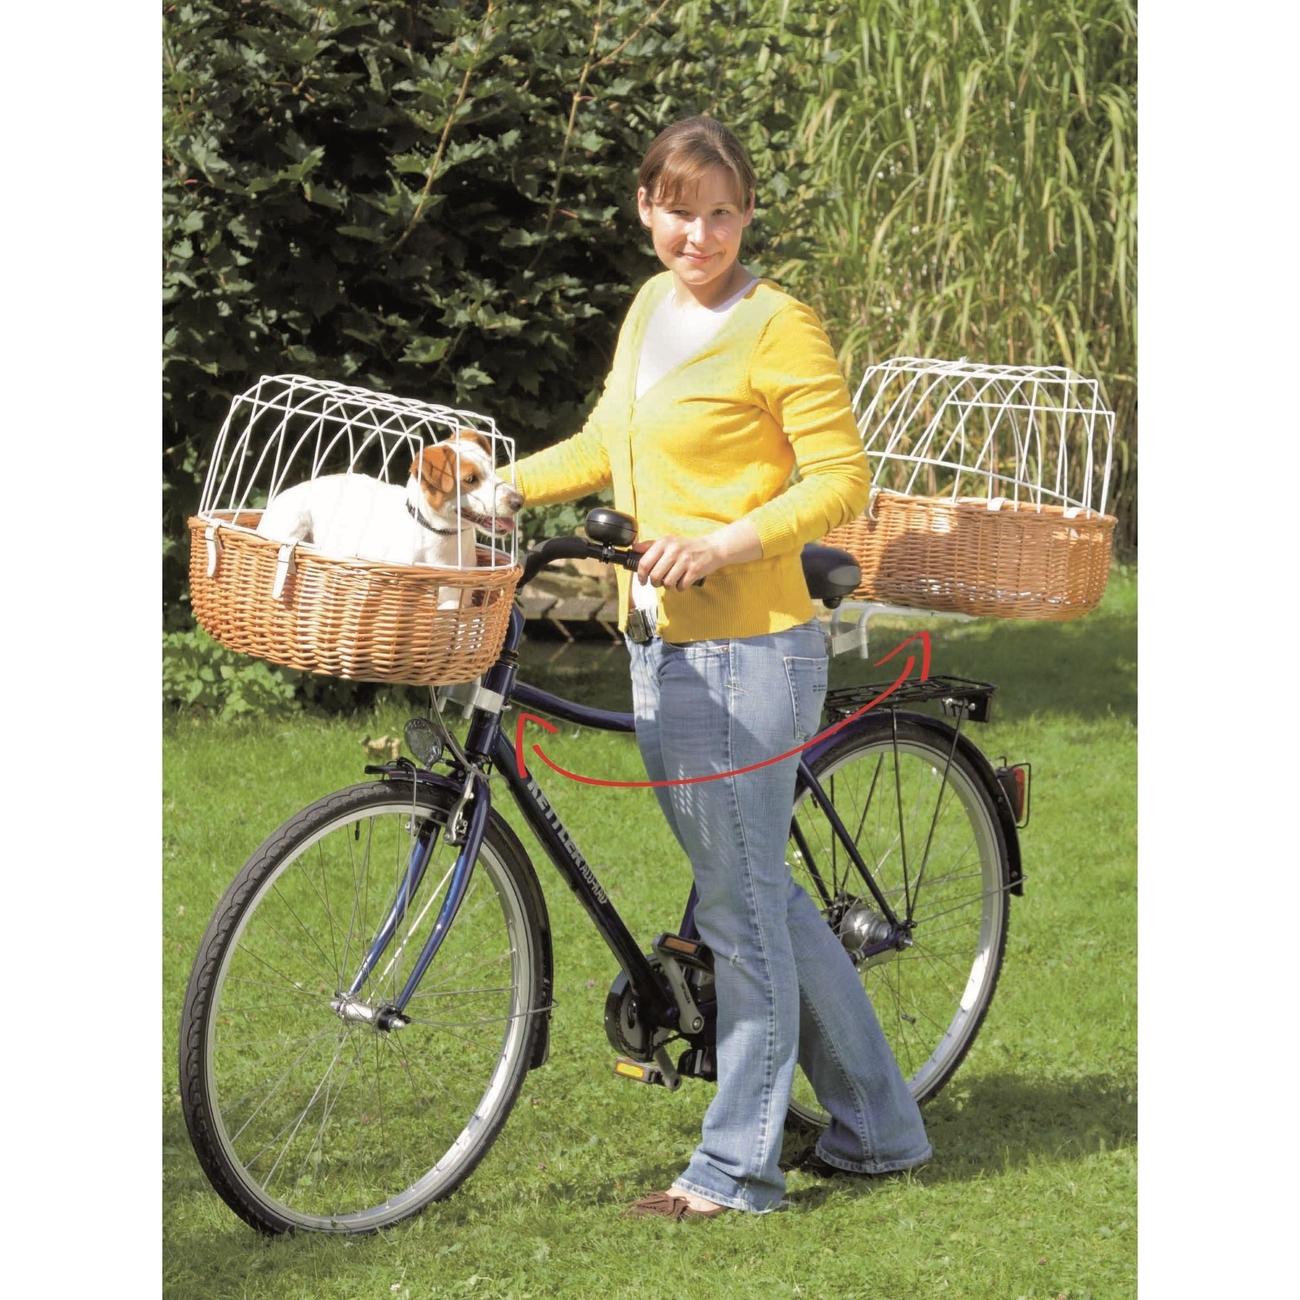 Aumüller Universalhalter Nr. 161 für Fahrradkörbe, Bild 4